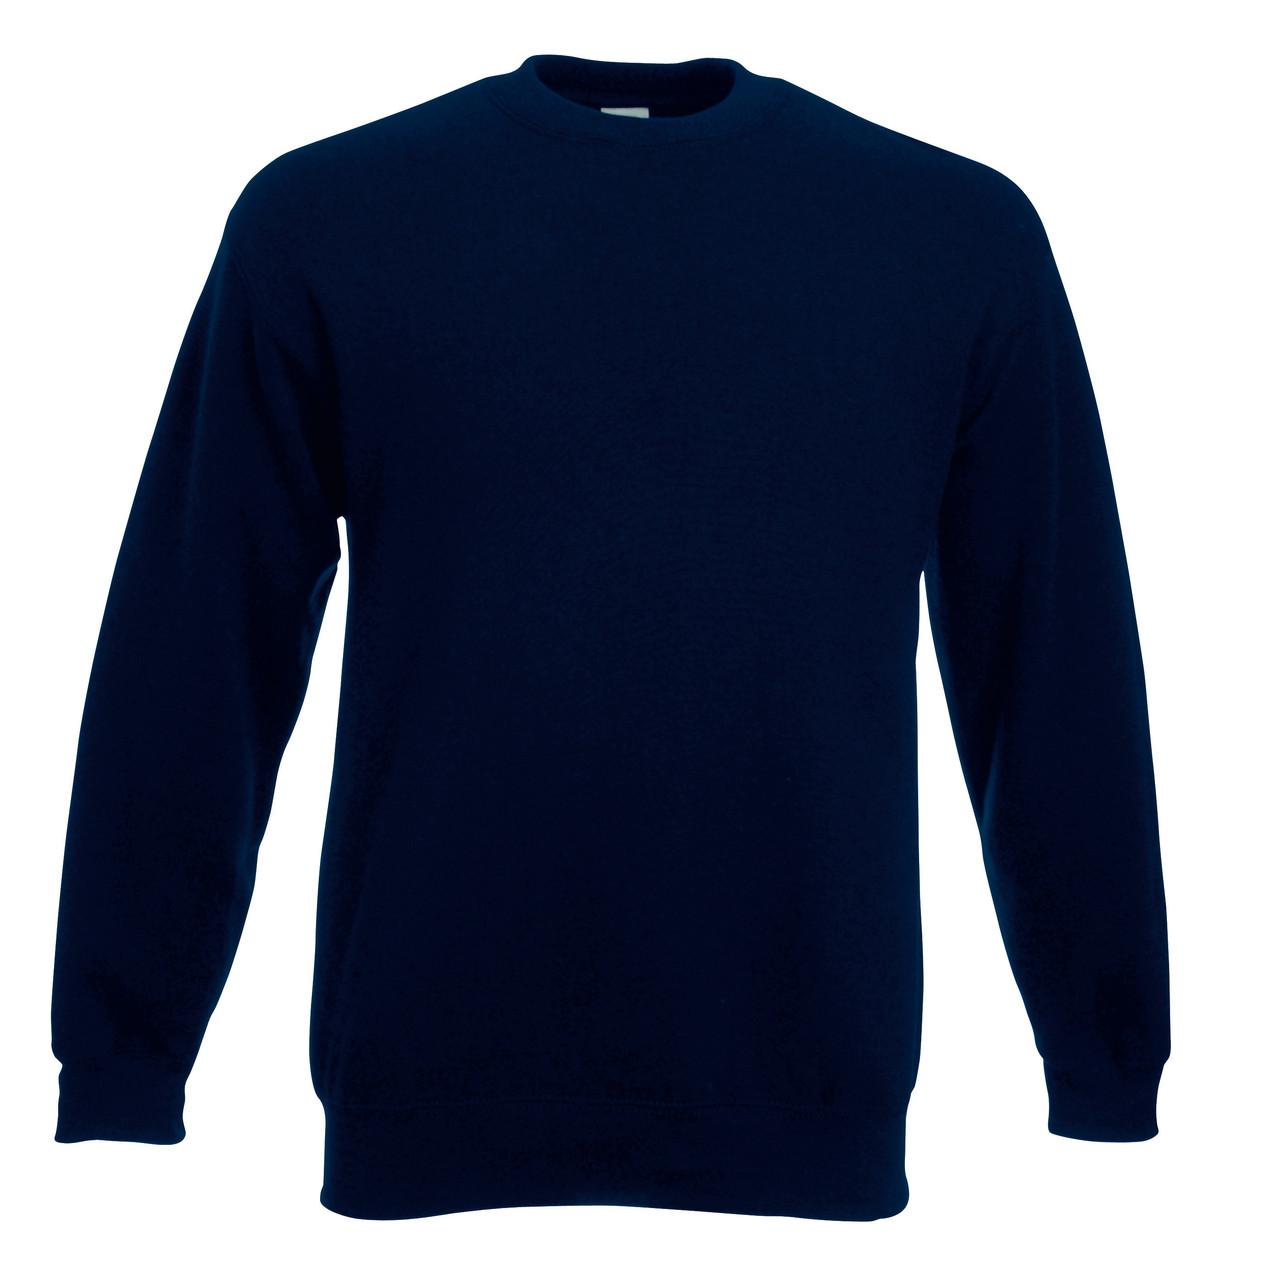 Мужской классический свитер Глубокий Тёмно-синий Fruit Of The Loom 62-202-AZ Xl